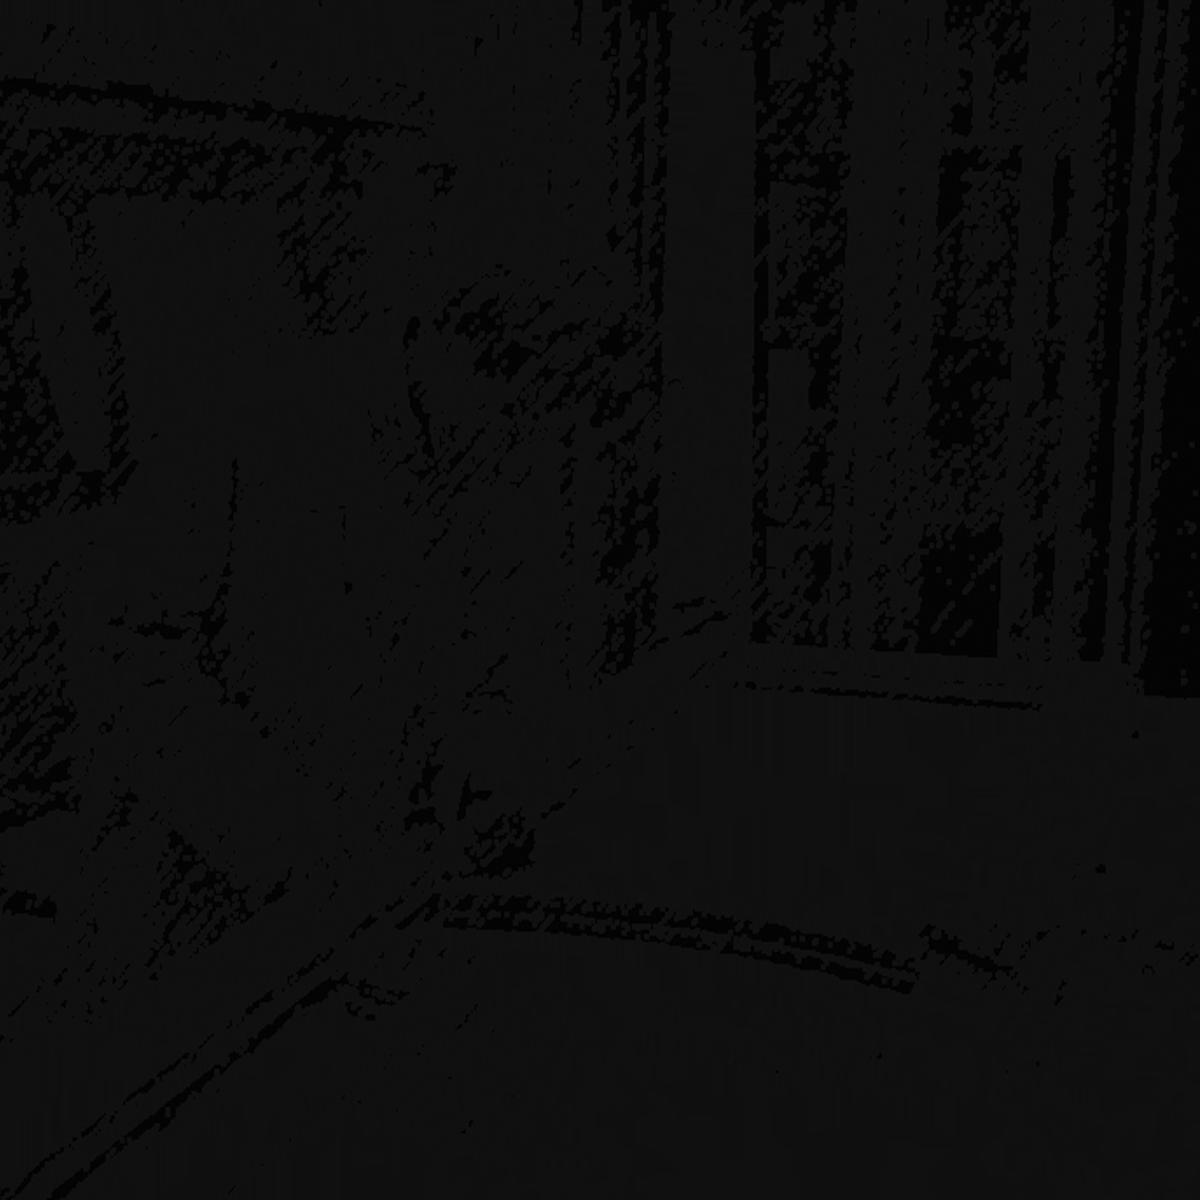 https://www.maxporte.it/wp-content/uploads/2021/05/back3-alternative-maxporte.png